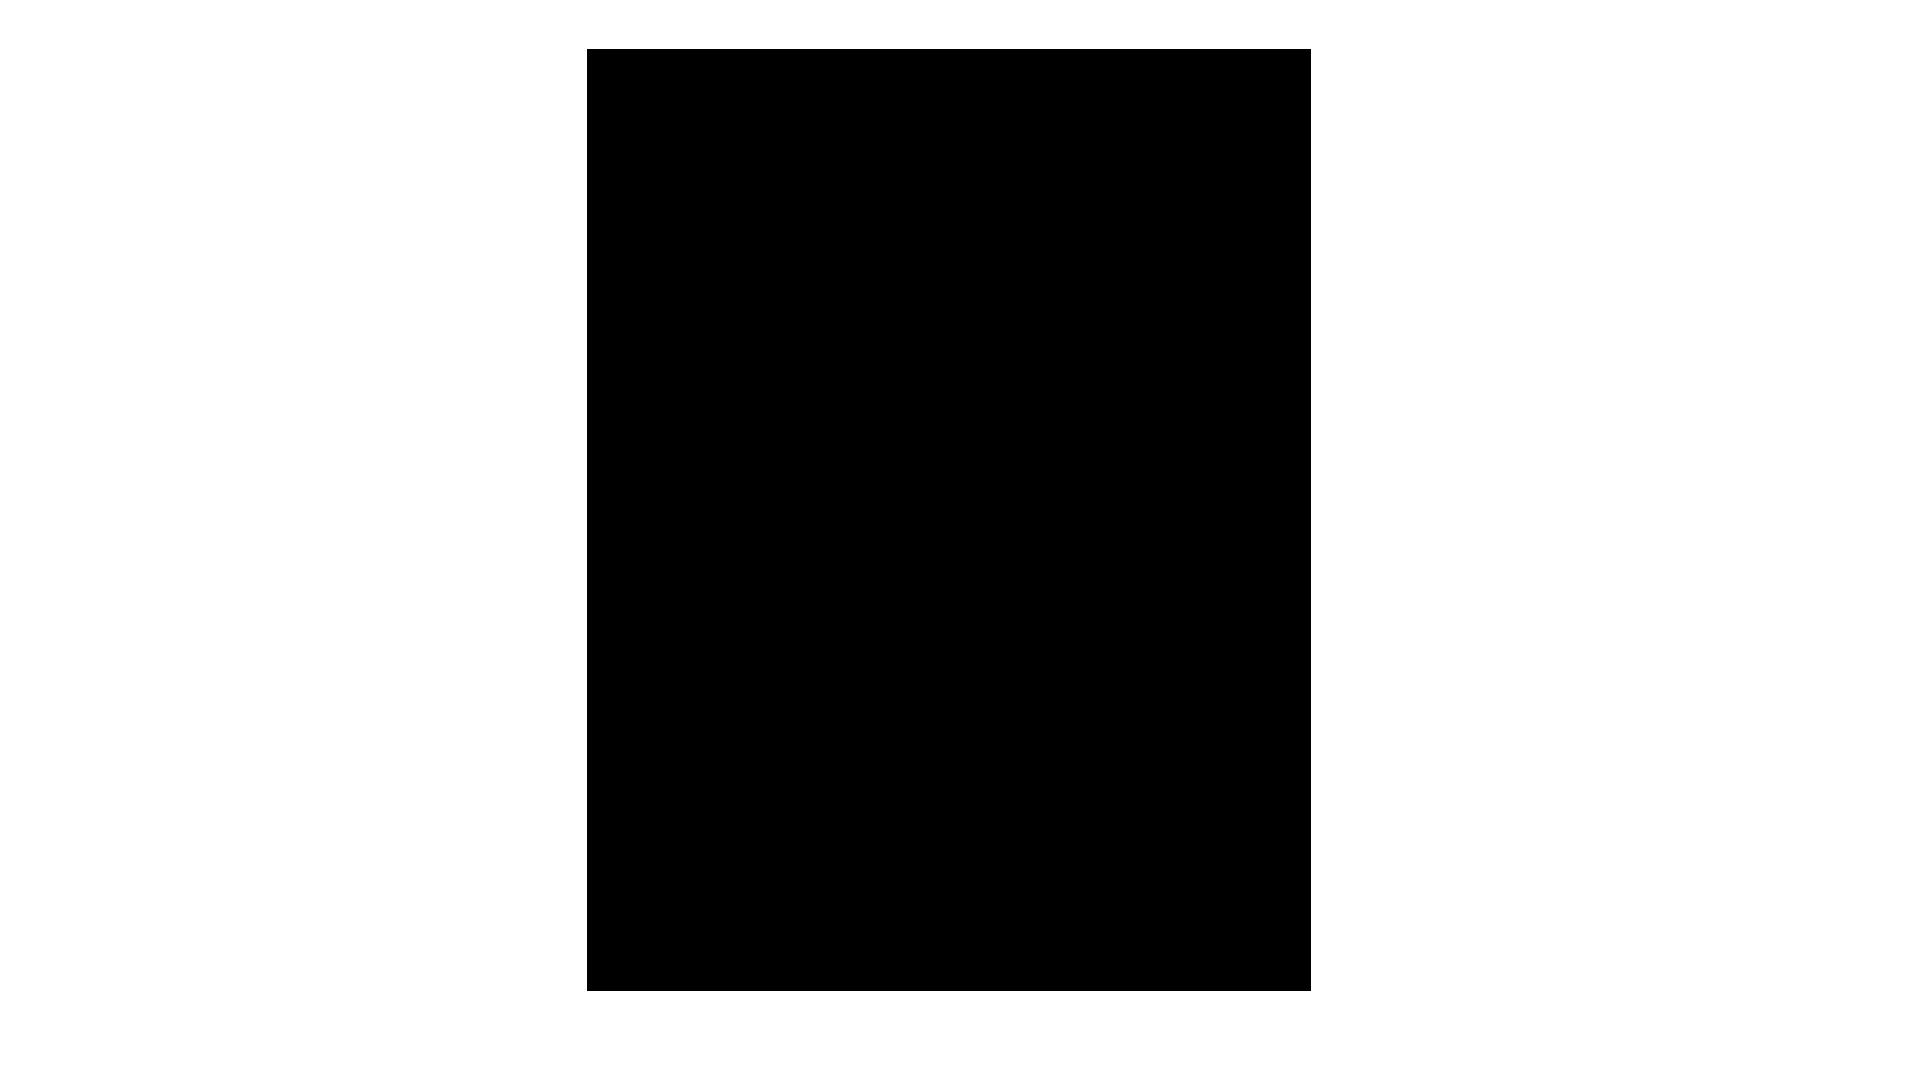 LOGO - le led -LED